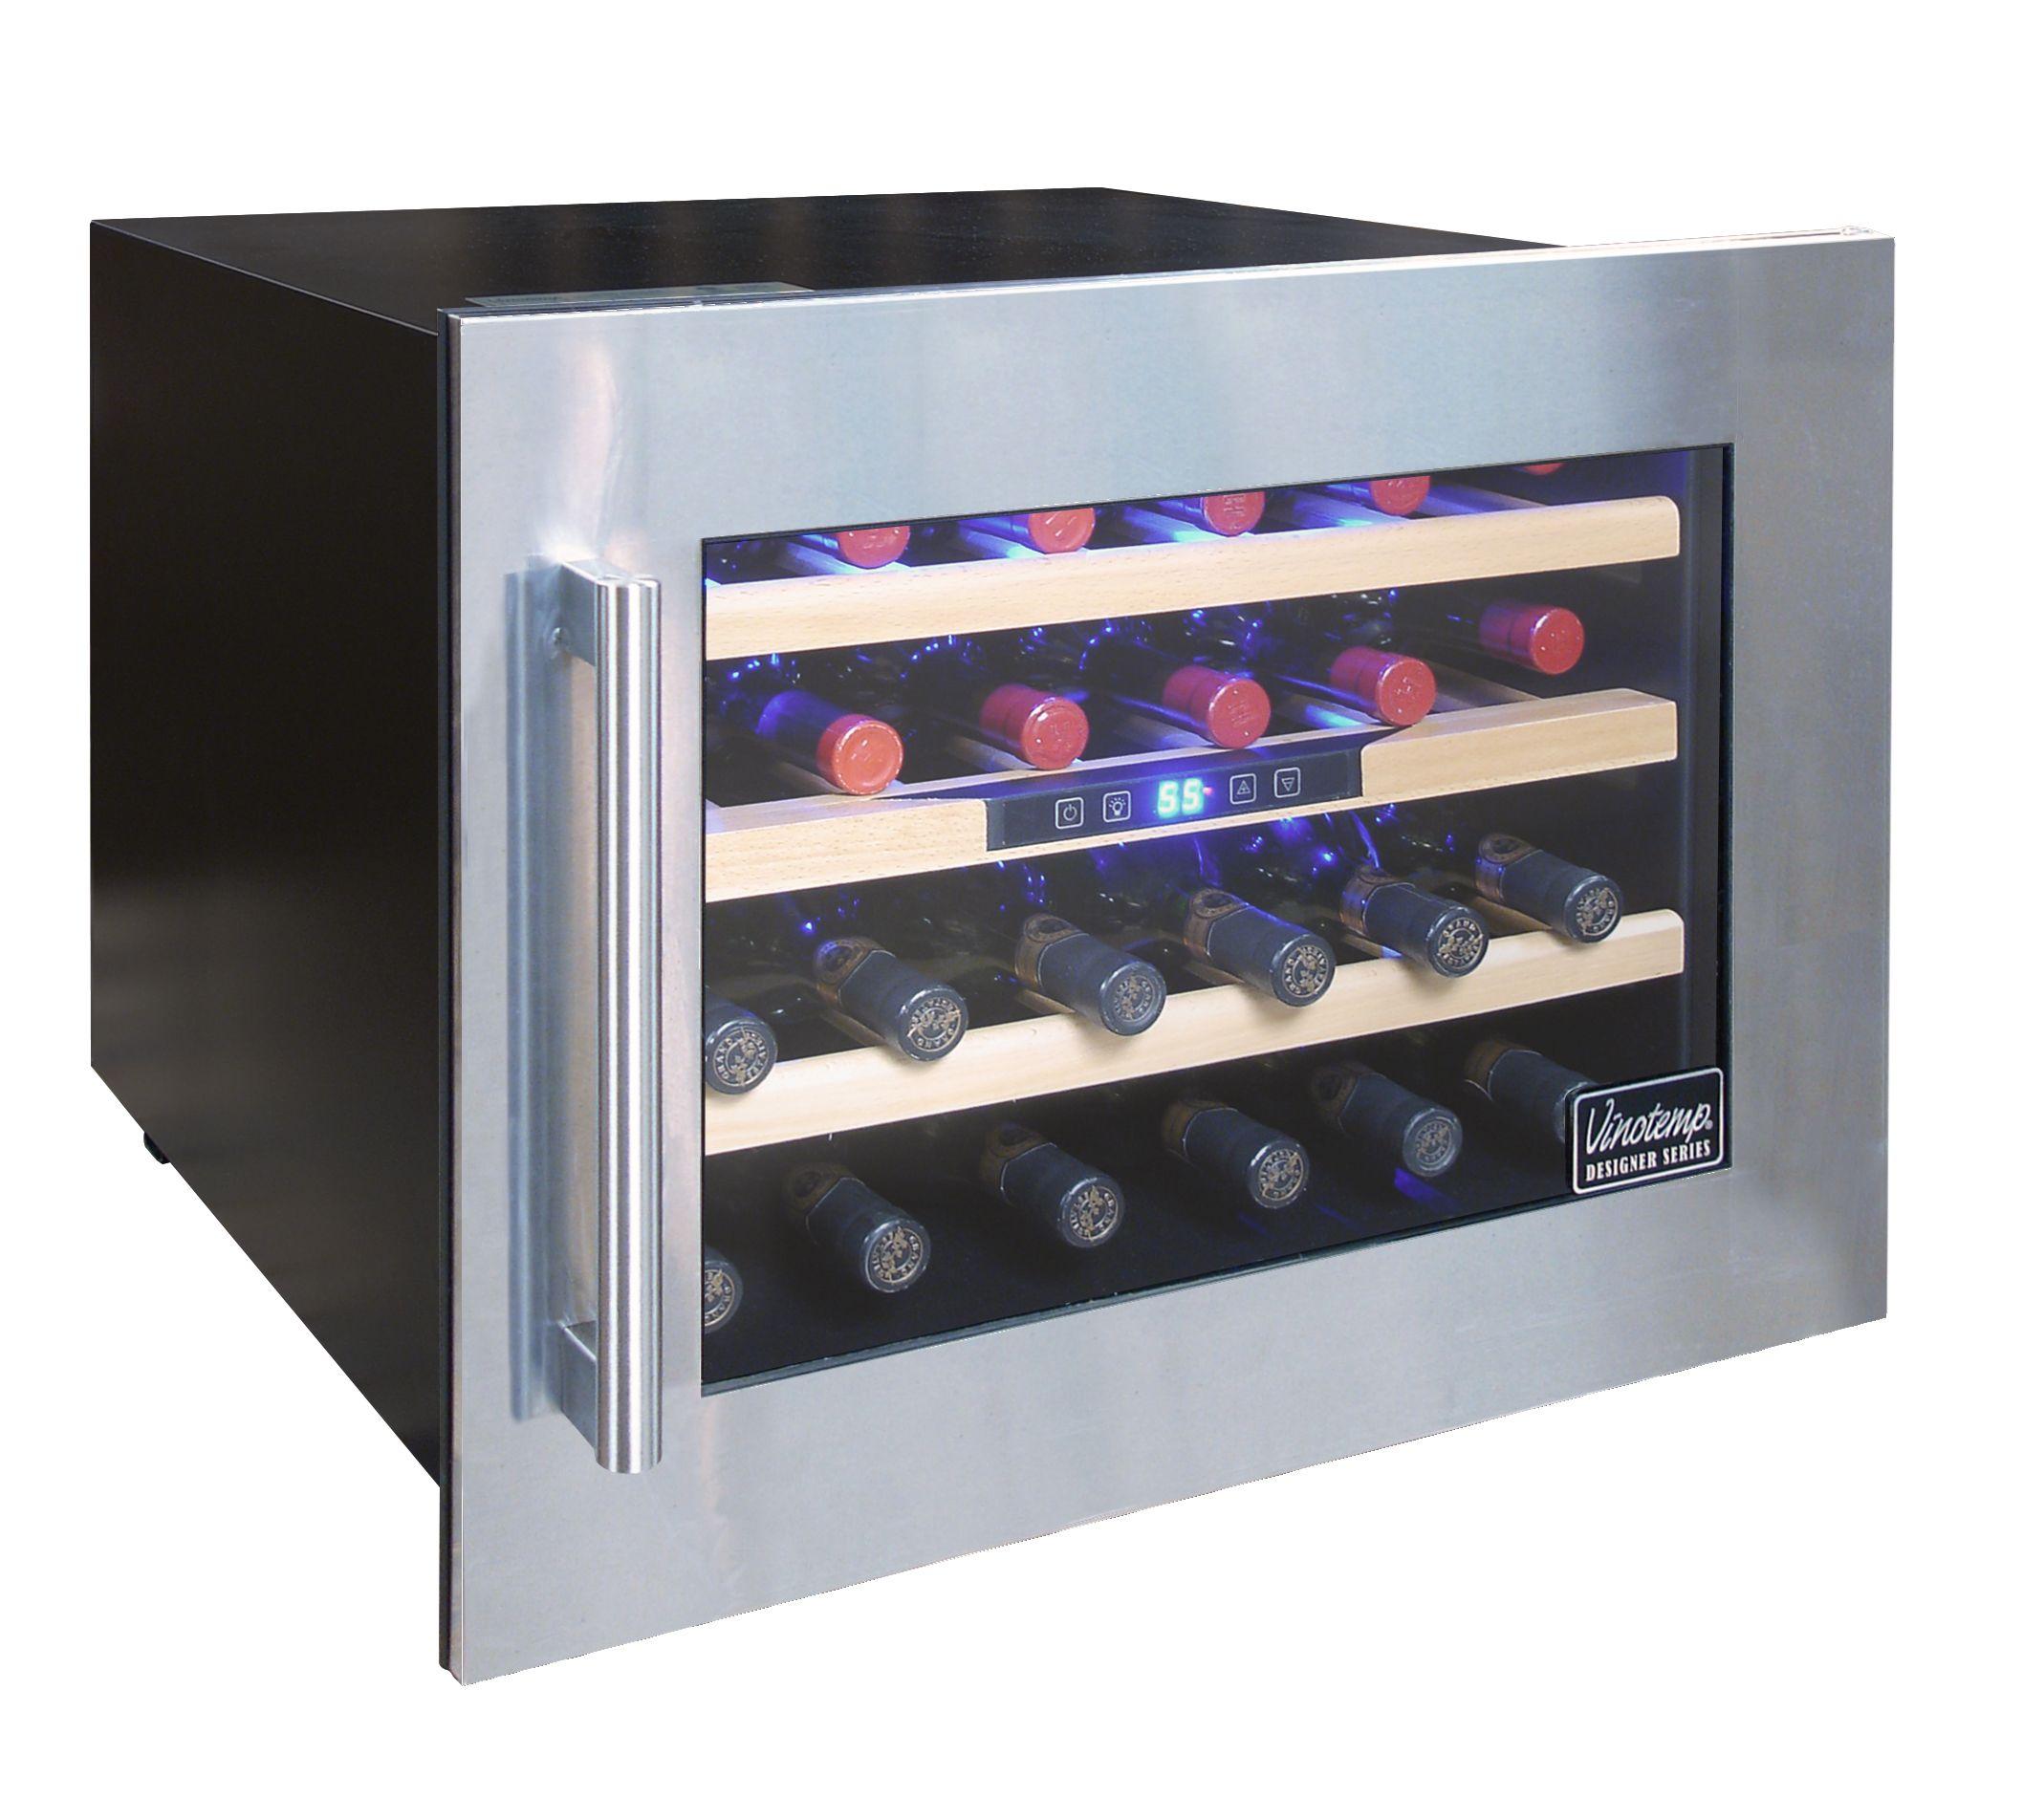 Designer Series 24 Bottle Seamless Wall Mounted Wine Cooler